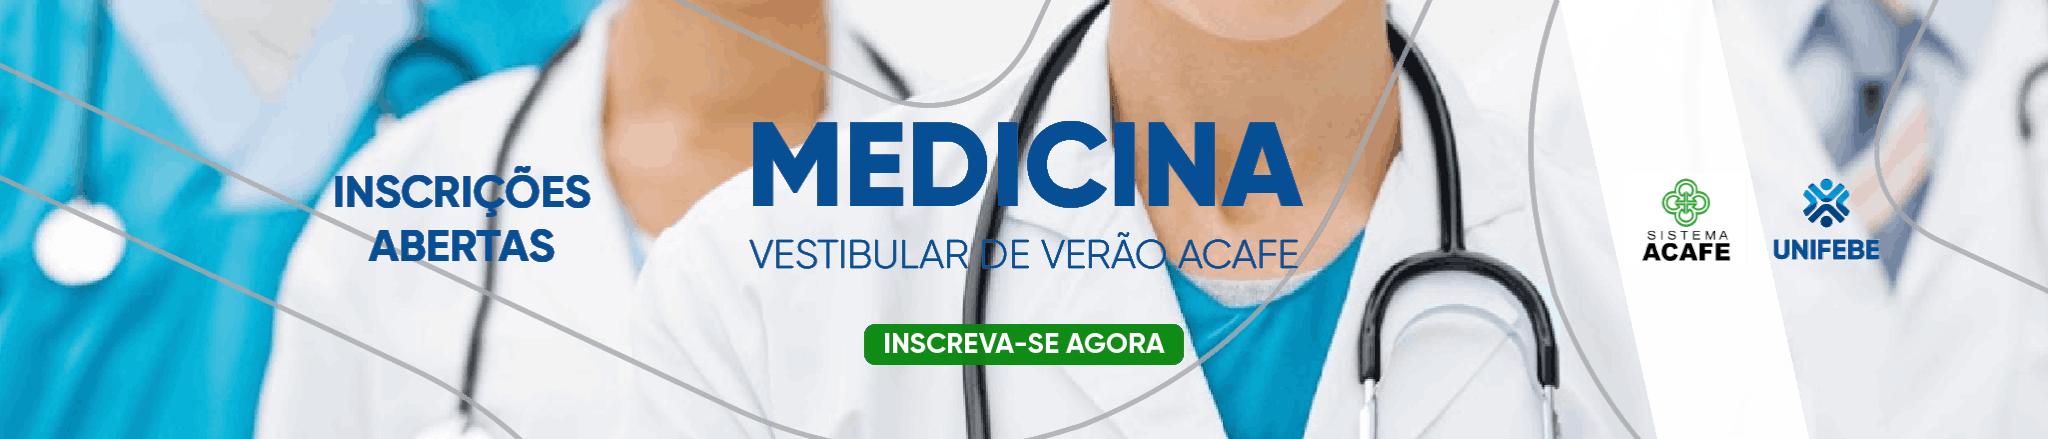 Banner Medicina Desktop